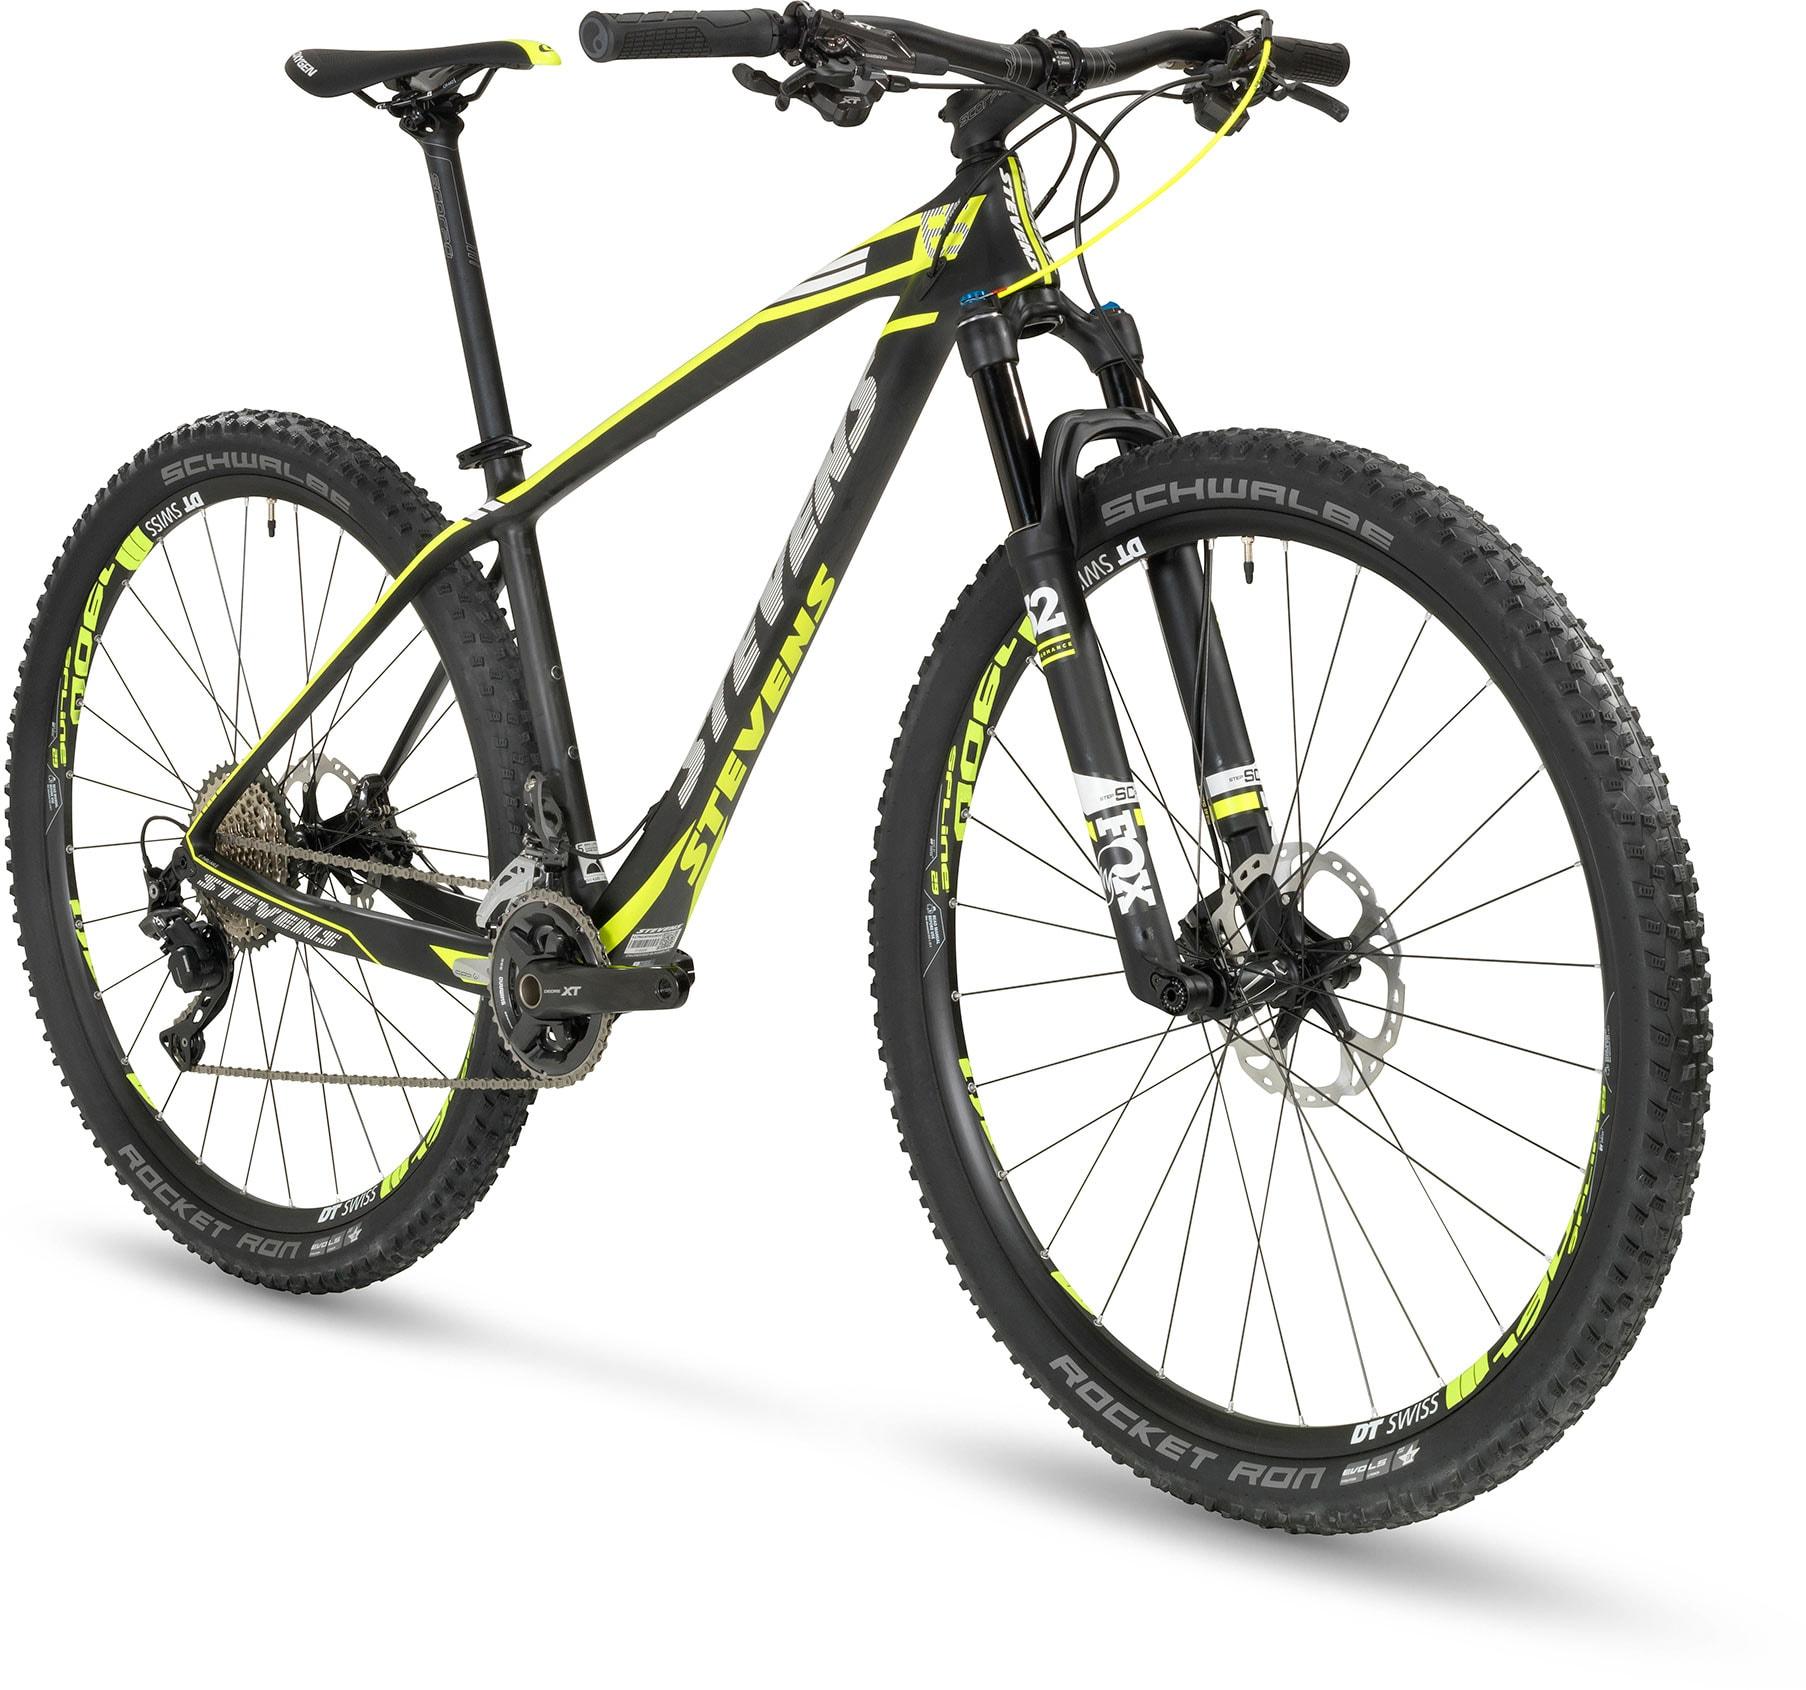 Sonora ES - Stevens Bikes 2017